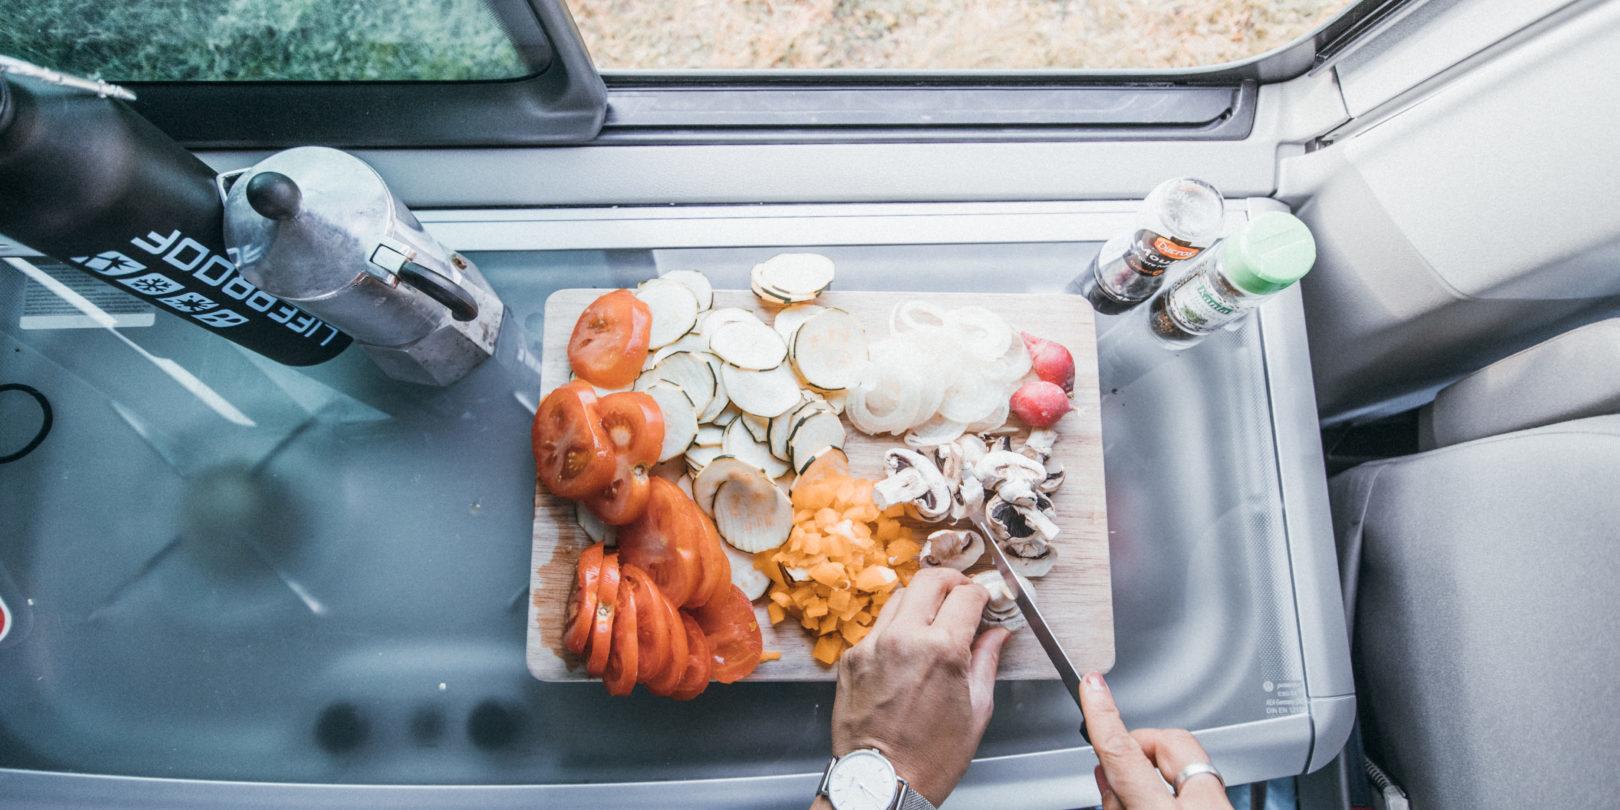 Corsica Frankrijk campervans Blacksheep CALIFORNIA BLACKSHEEP keuken koffie snijwerk